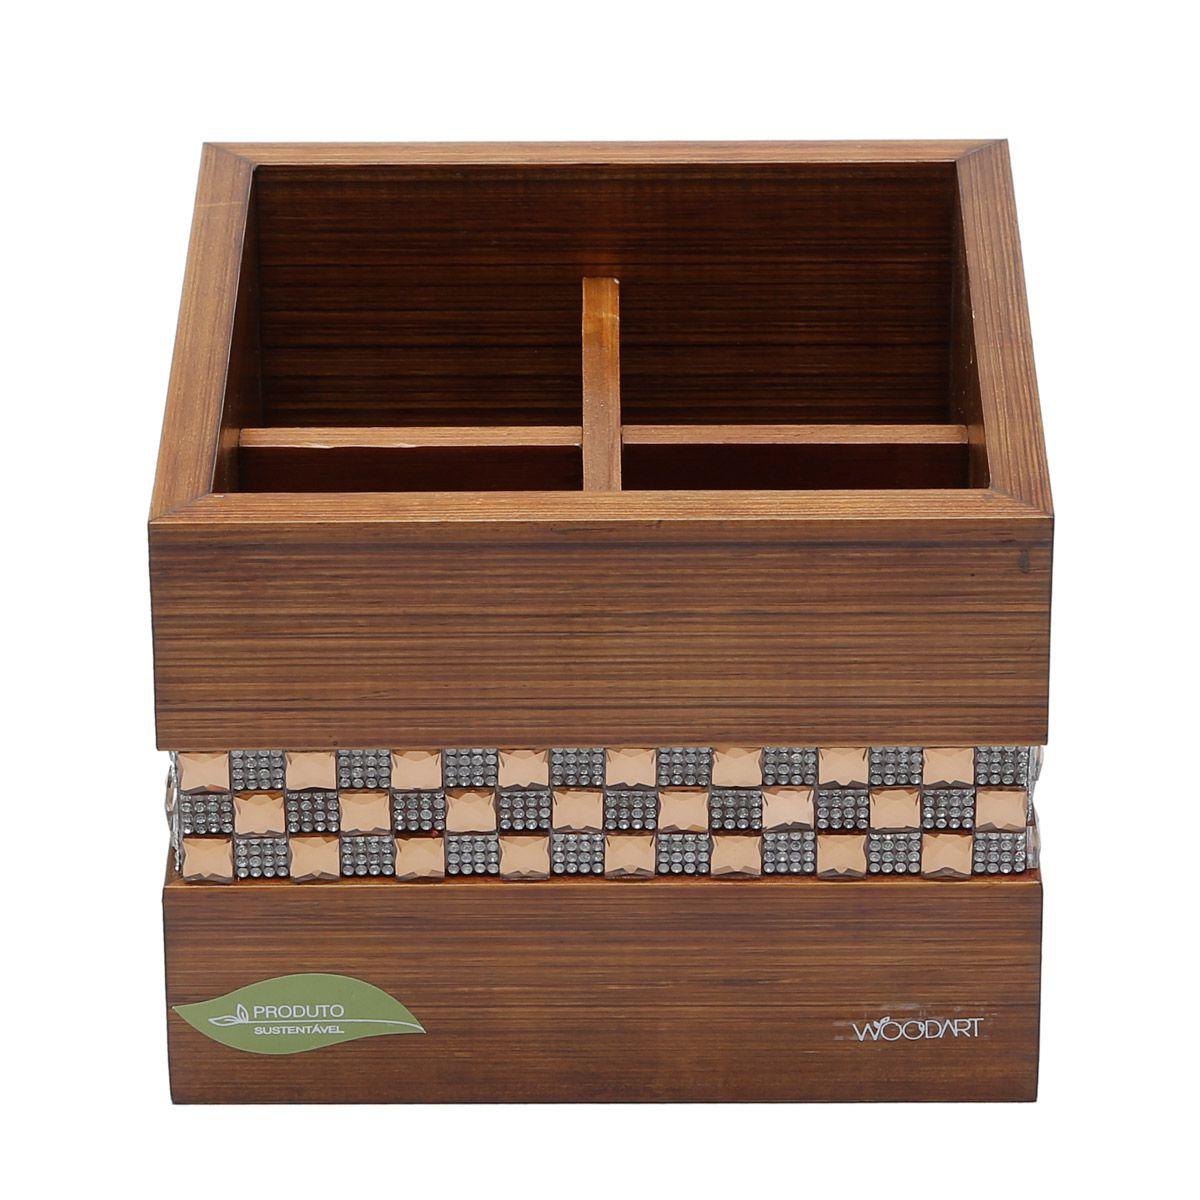 Porta-talheres 17 x 17 cm de madeira marrom Diamond Woodart - 11996